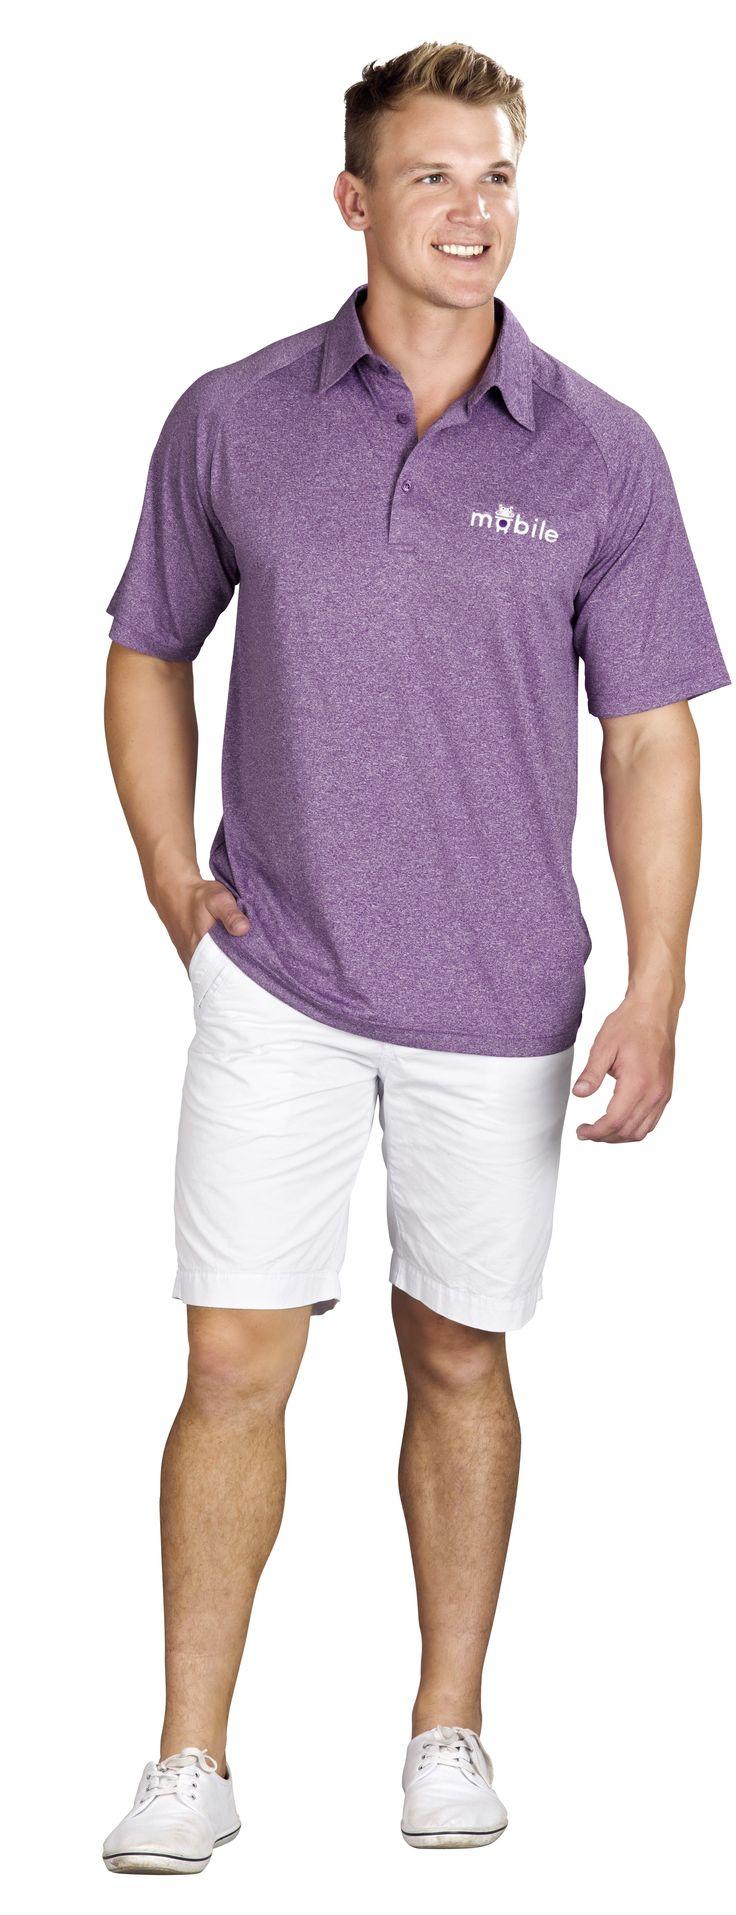 Triumph Mens Golf Shirt Fashion Polo Shirt Melange SLAZ-5835